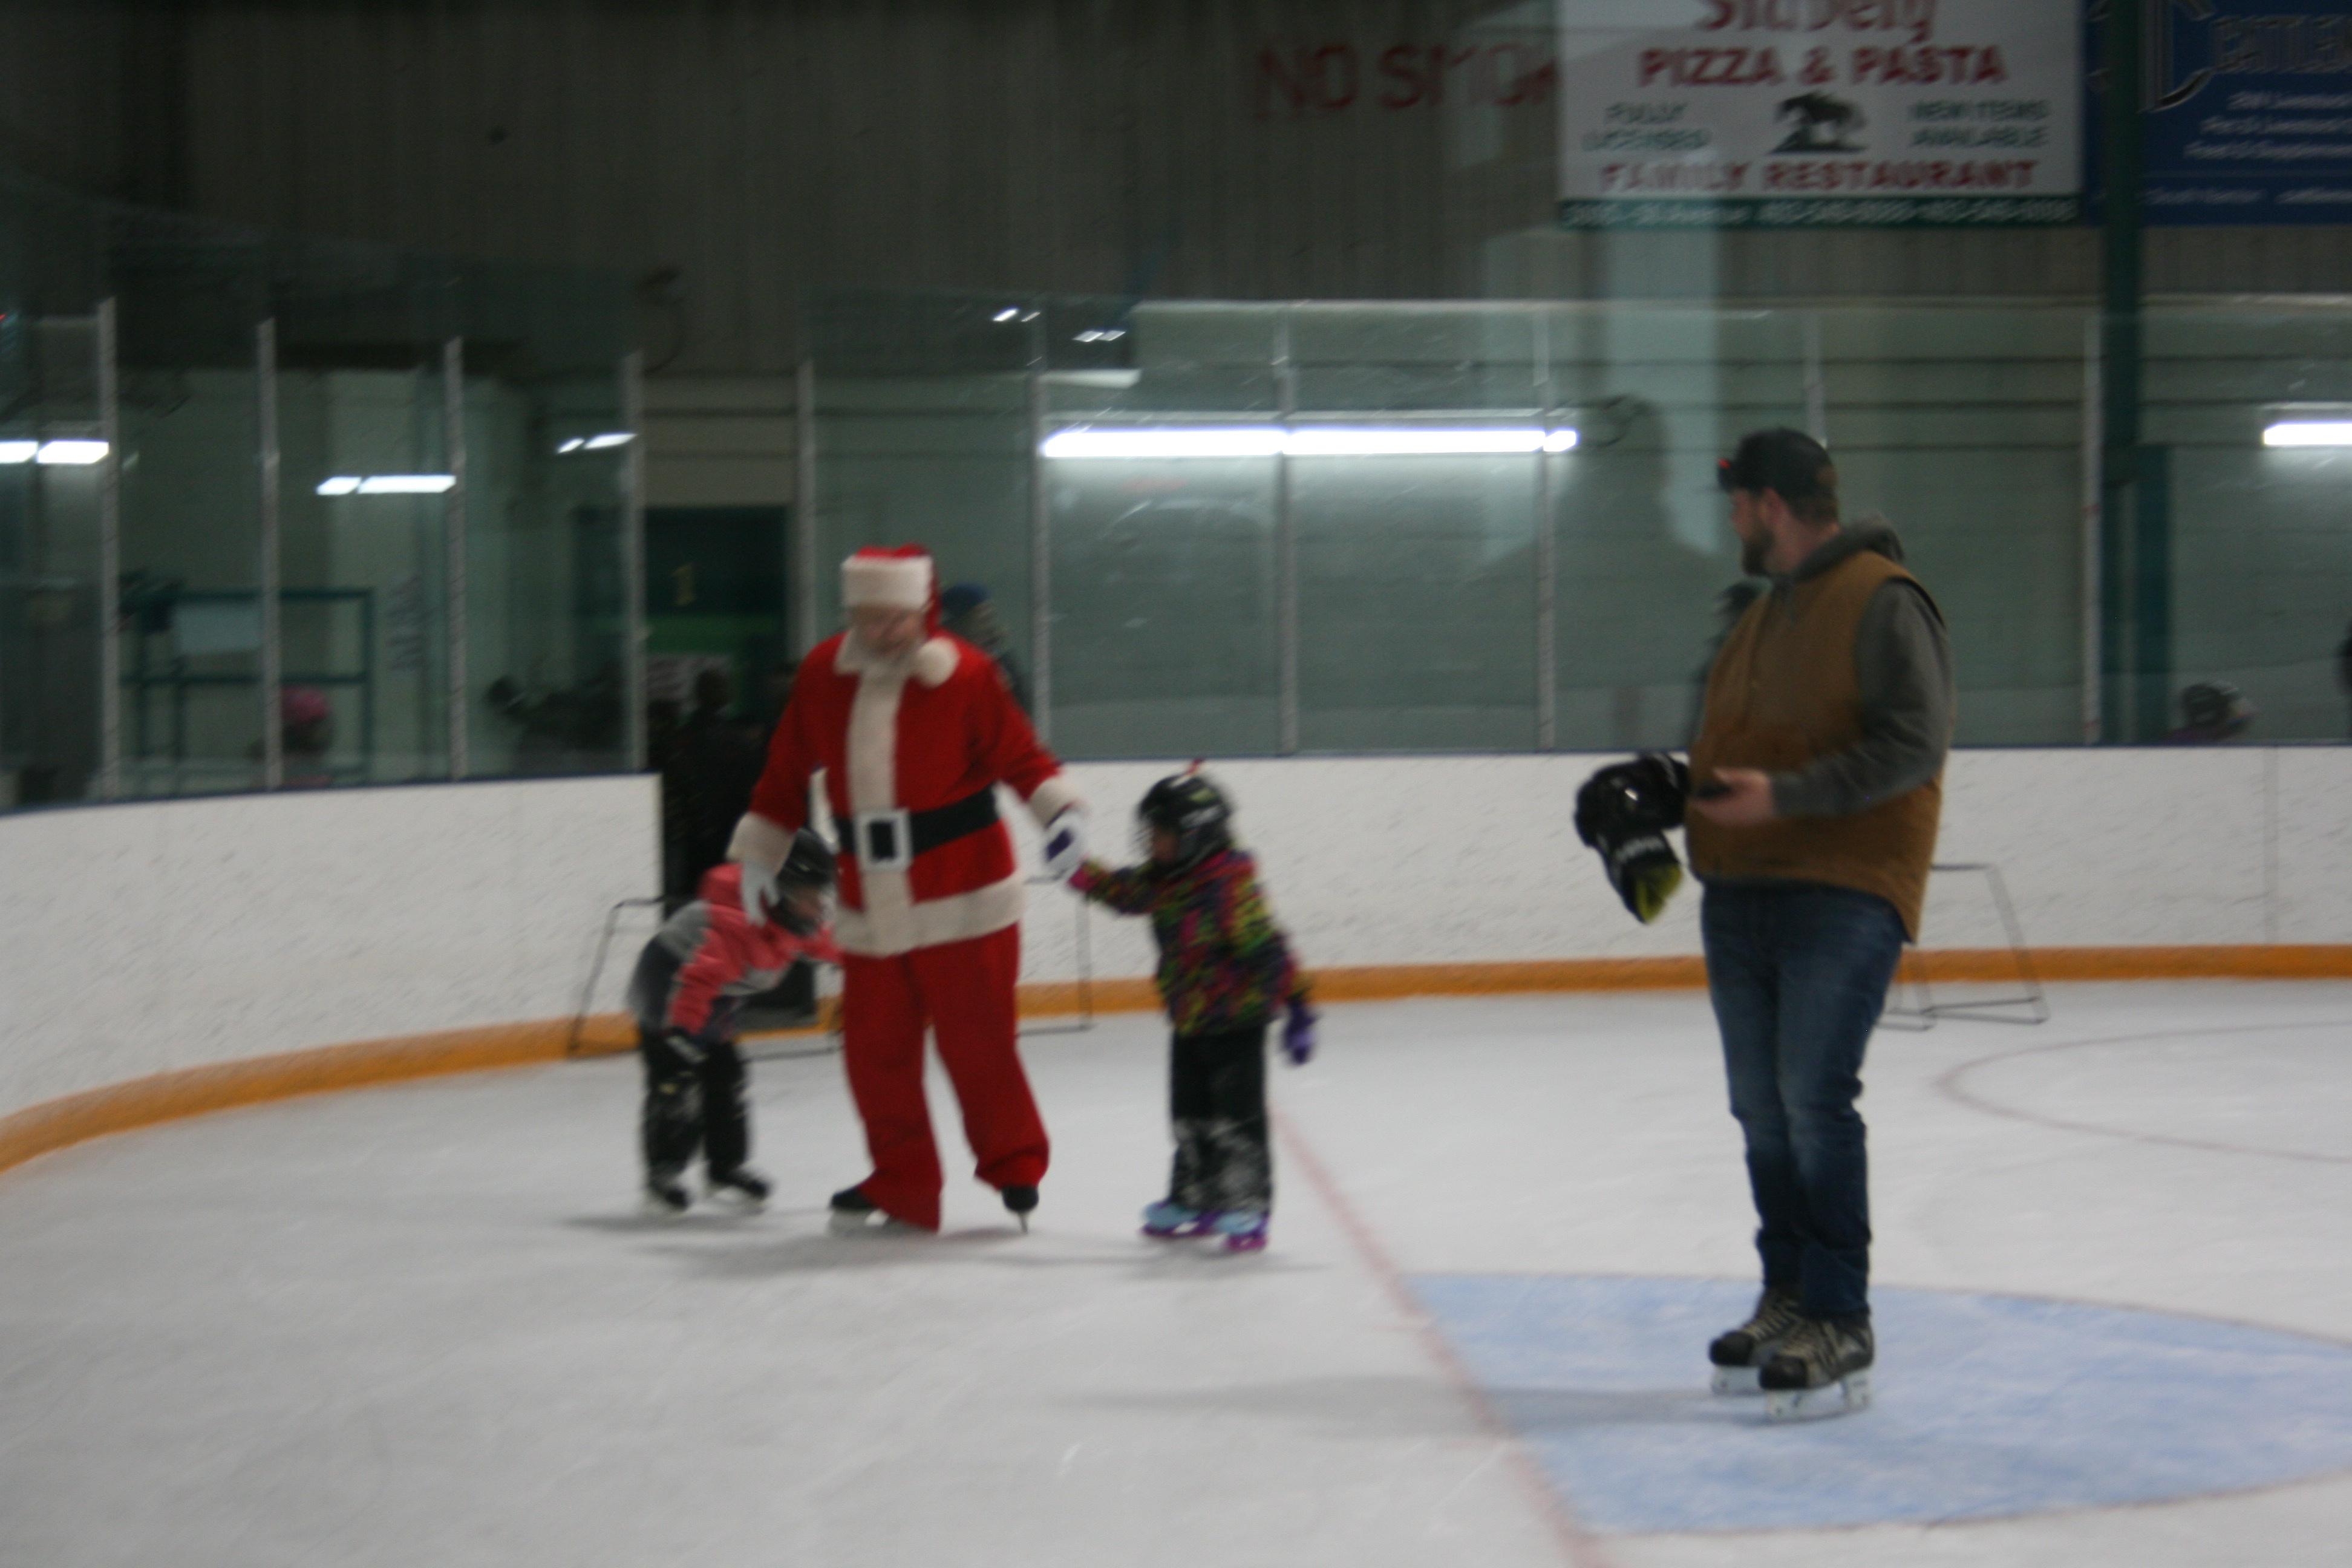 https://0901.nccdn.net/4_2/000/000/024/ec9/santa-skate-17-3888x2592.jpg